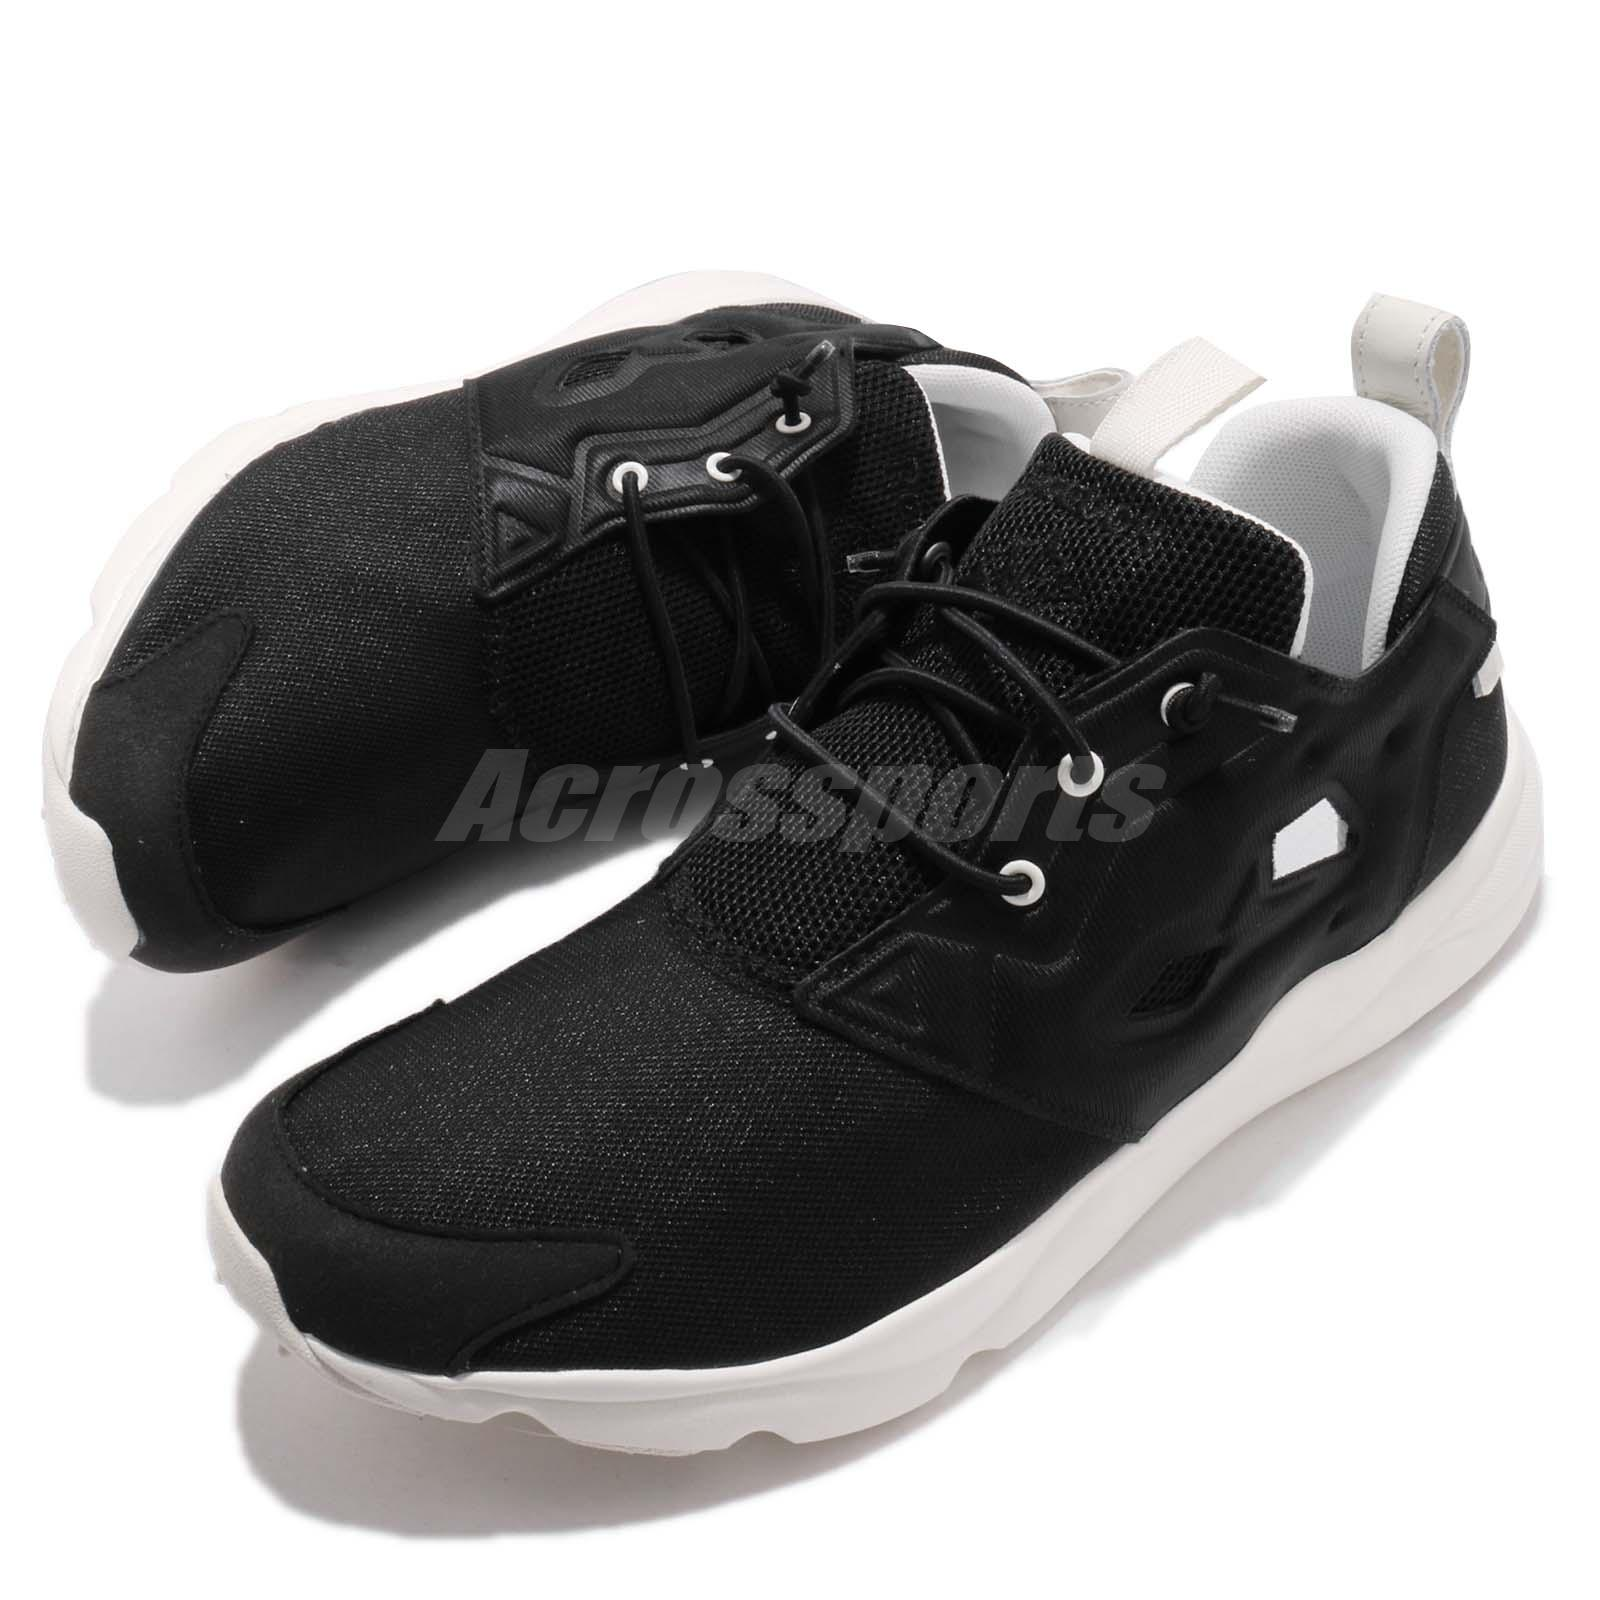 04e289c72648 Reebok Furylite Clean Black White Slip On Men Running Shoes Sneakers ...